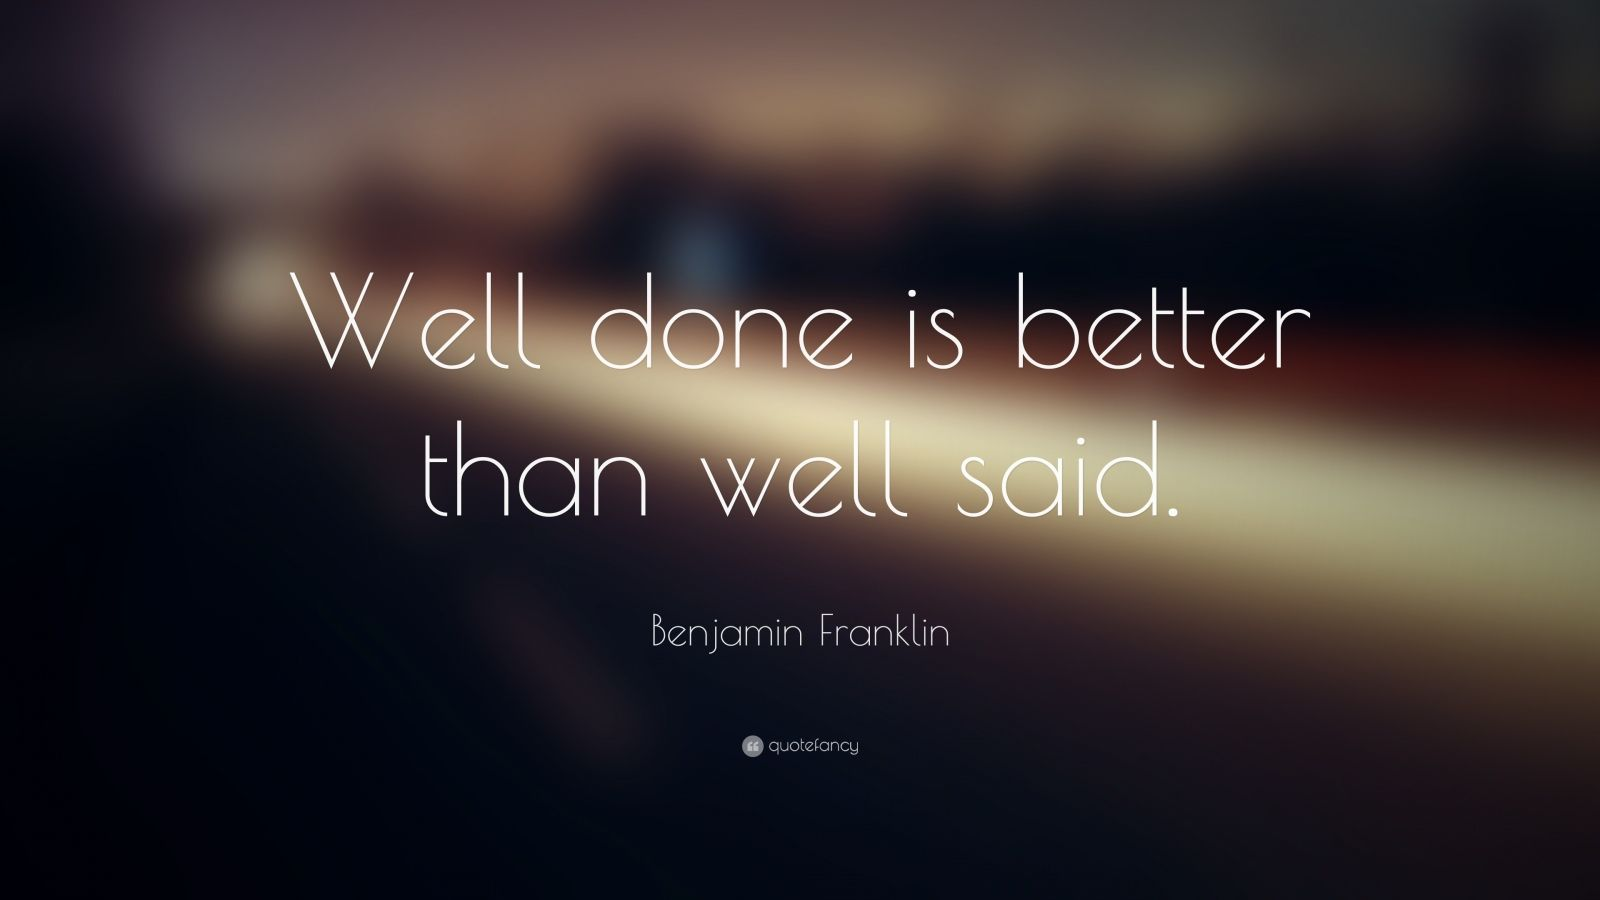 Warren Buffett Quotes Iphone Wallpaper Benjamin Franklin Quote Well Done Is Better Than Well